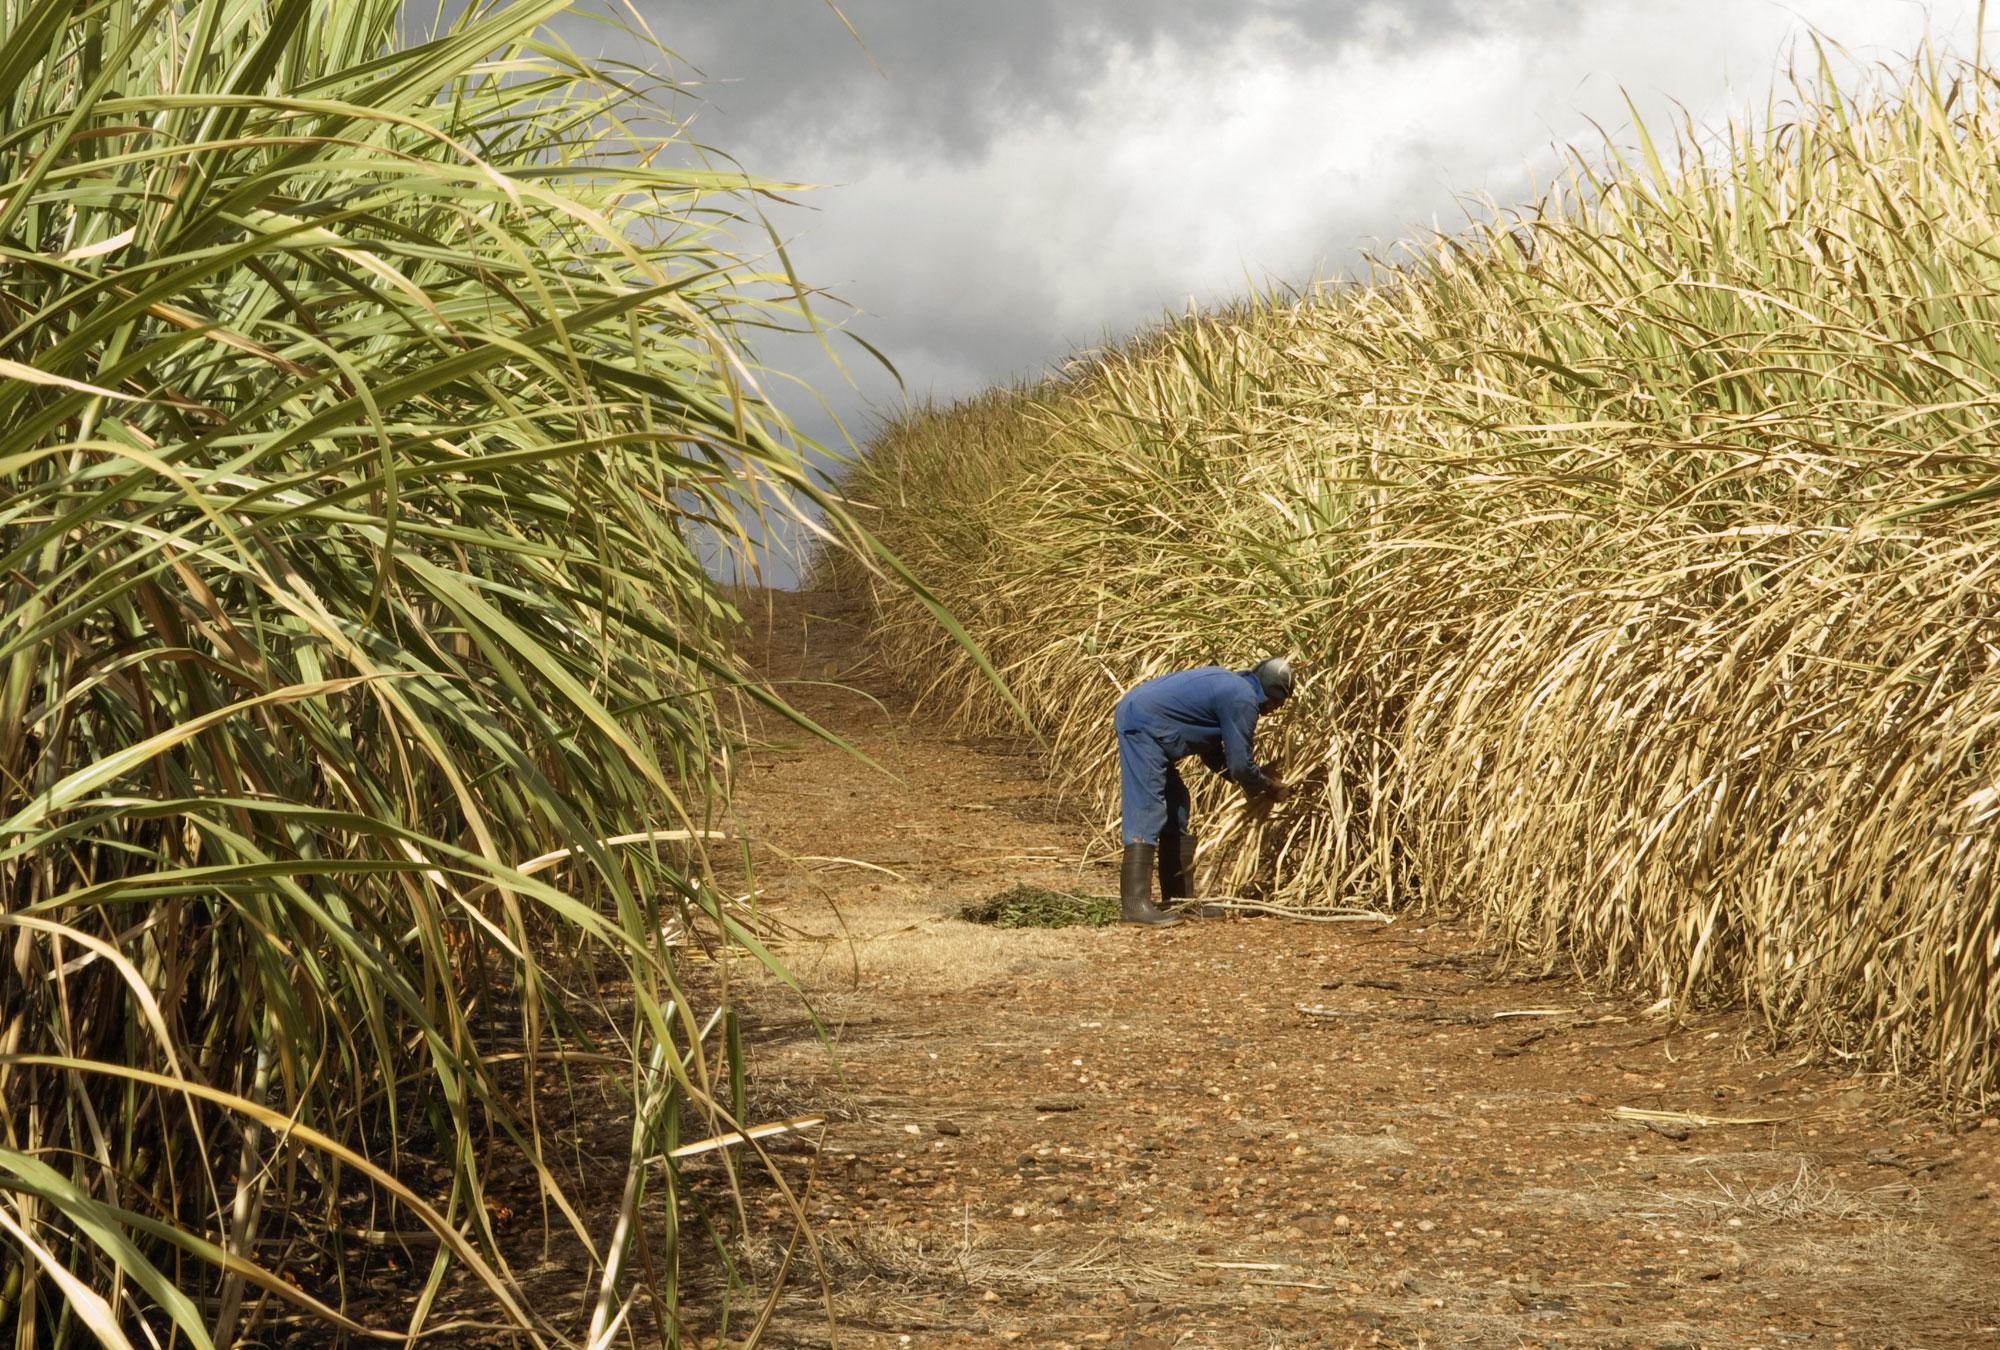 Man bends over between rows of sugarcane